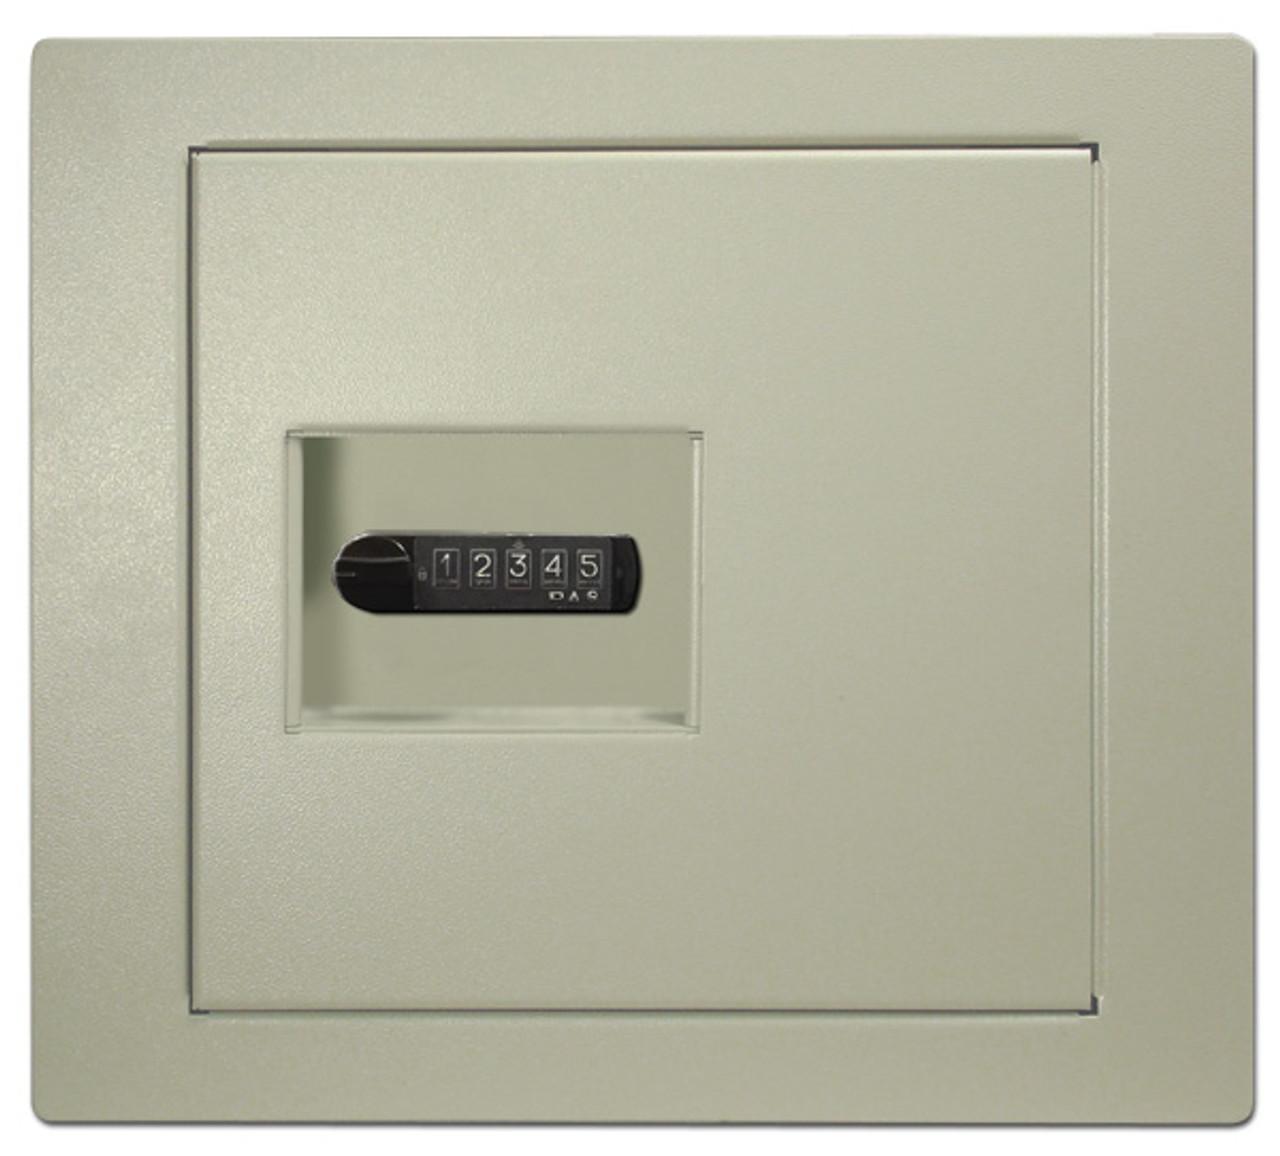 HPC WS-200-DL